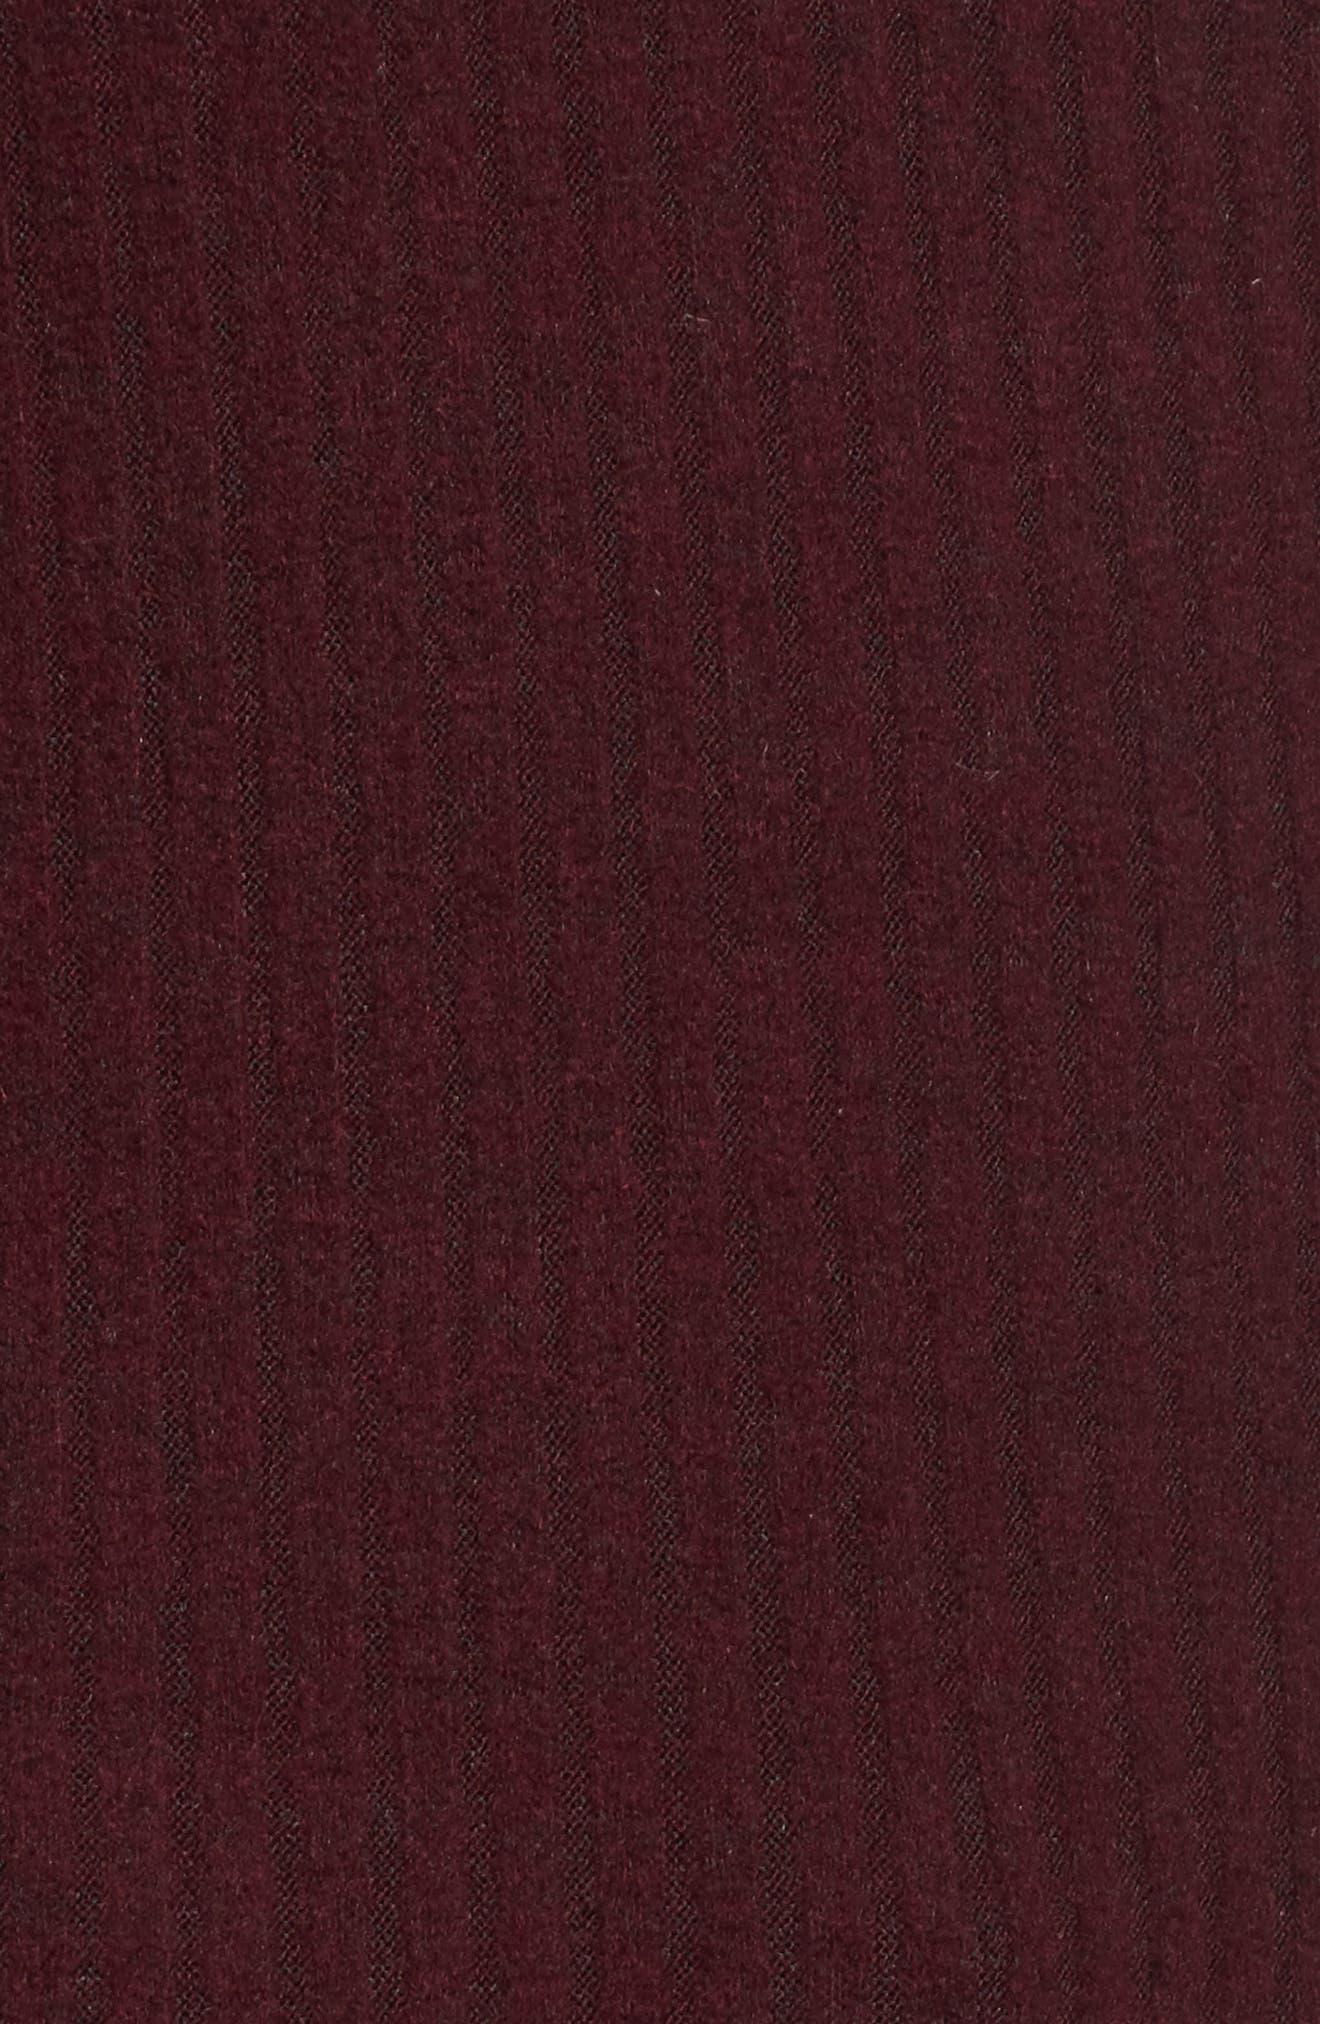 Marie Ruffle Sleeve Top,                             Alternate thumbnail 5, color,                             Burgundy